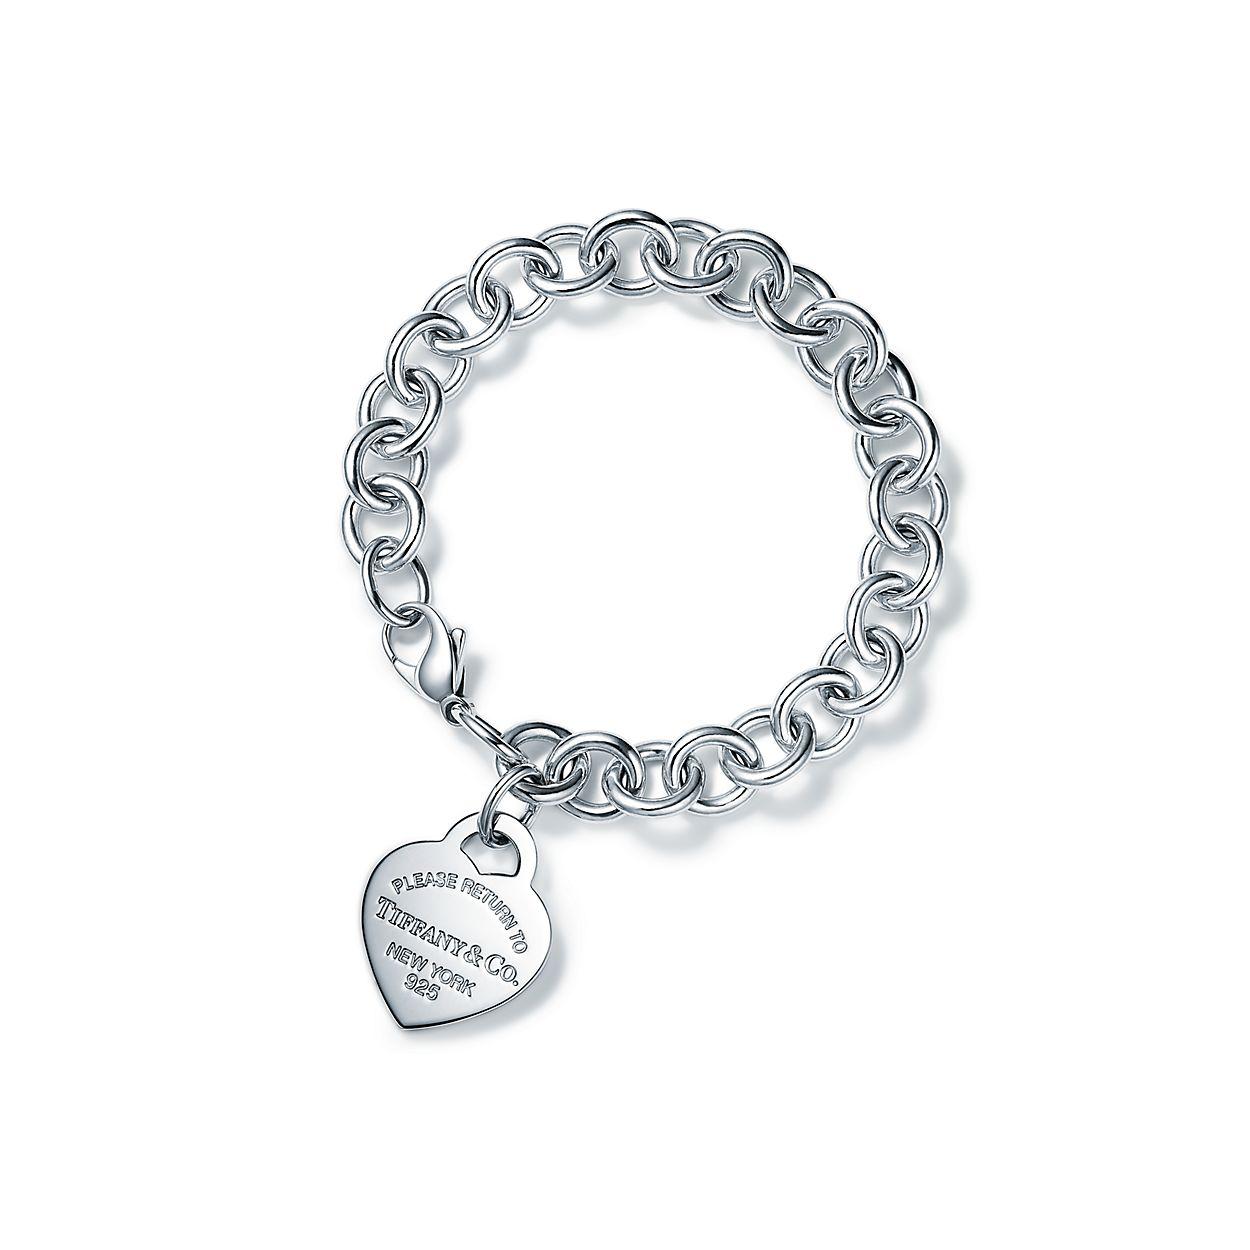 Sterling Silver Heart Tag Charm Bracelet Tiffany Co